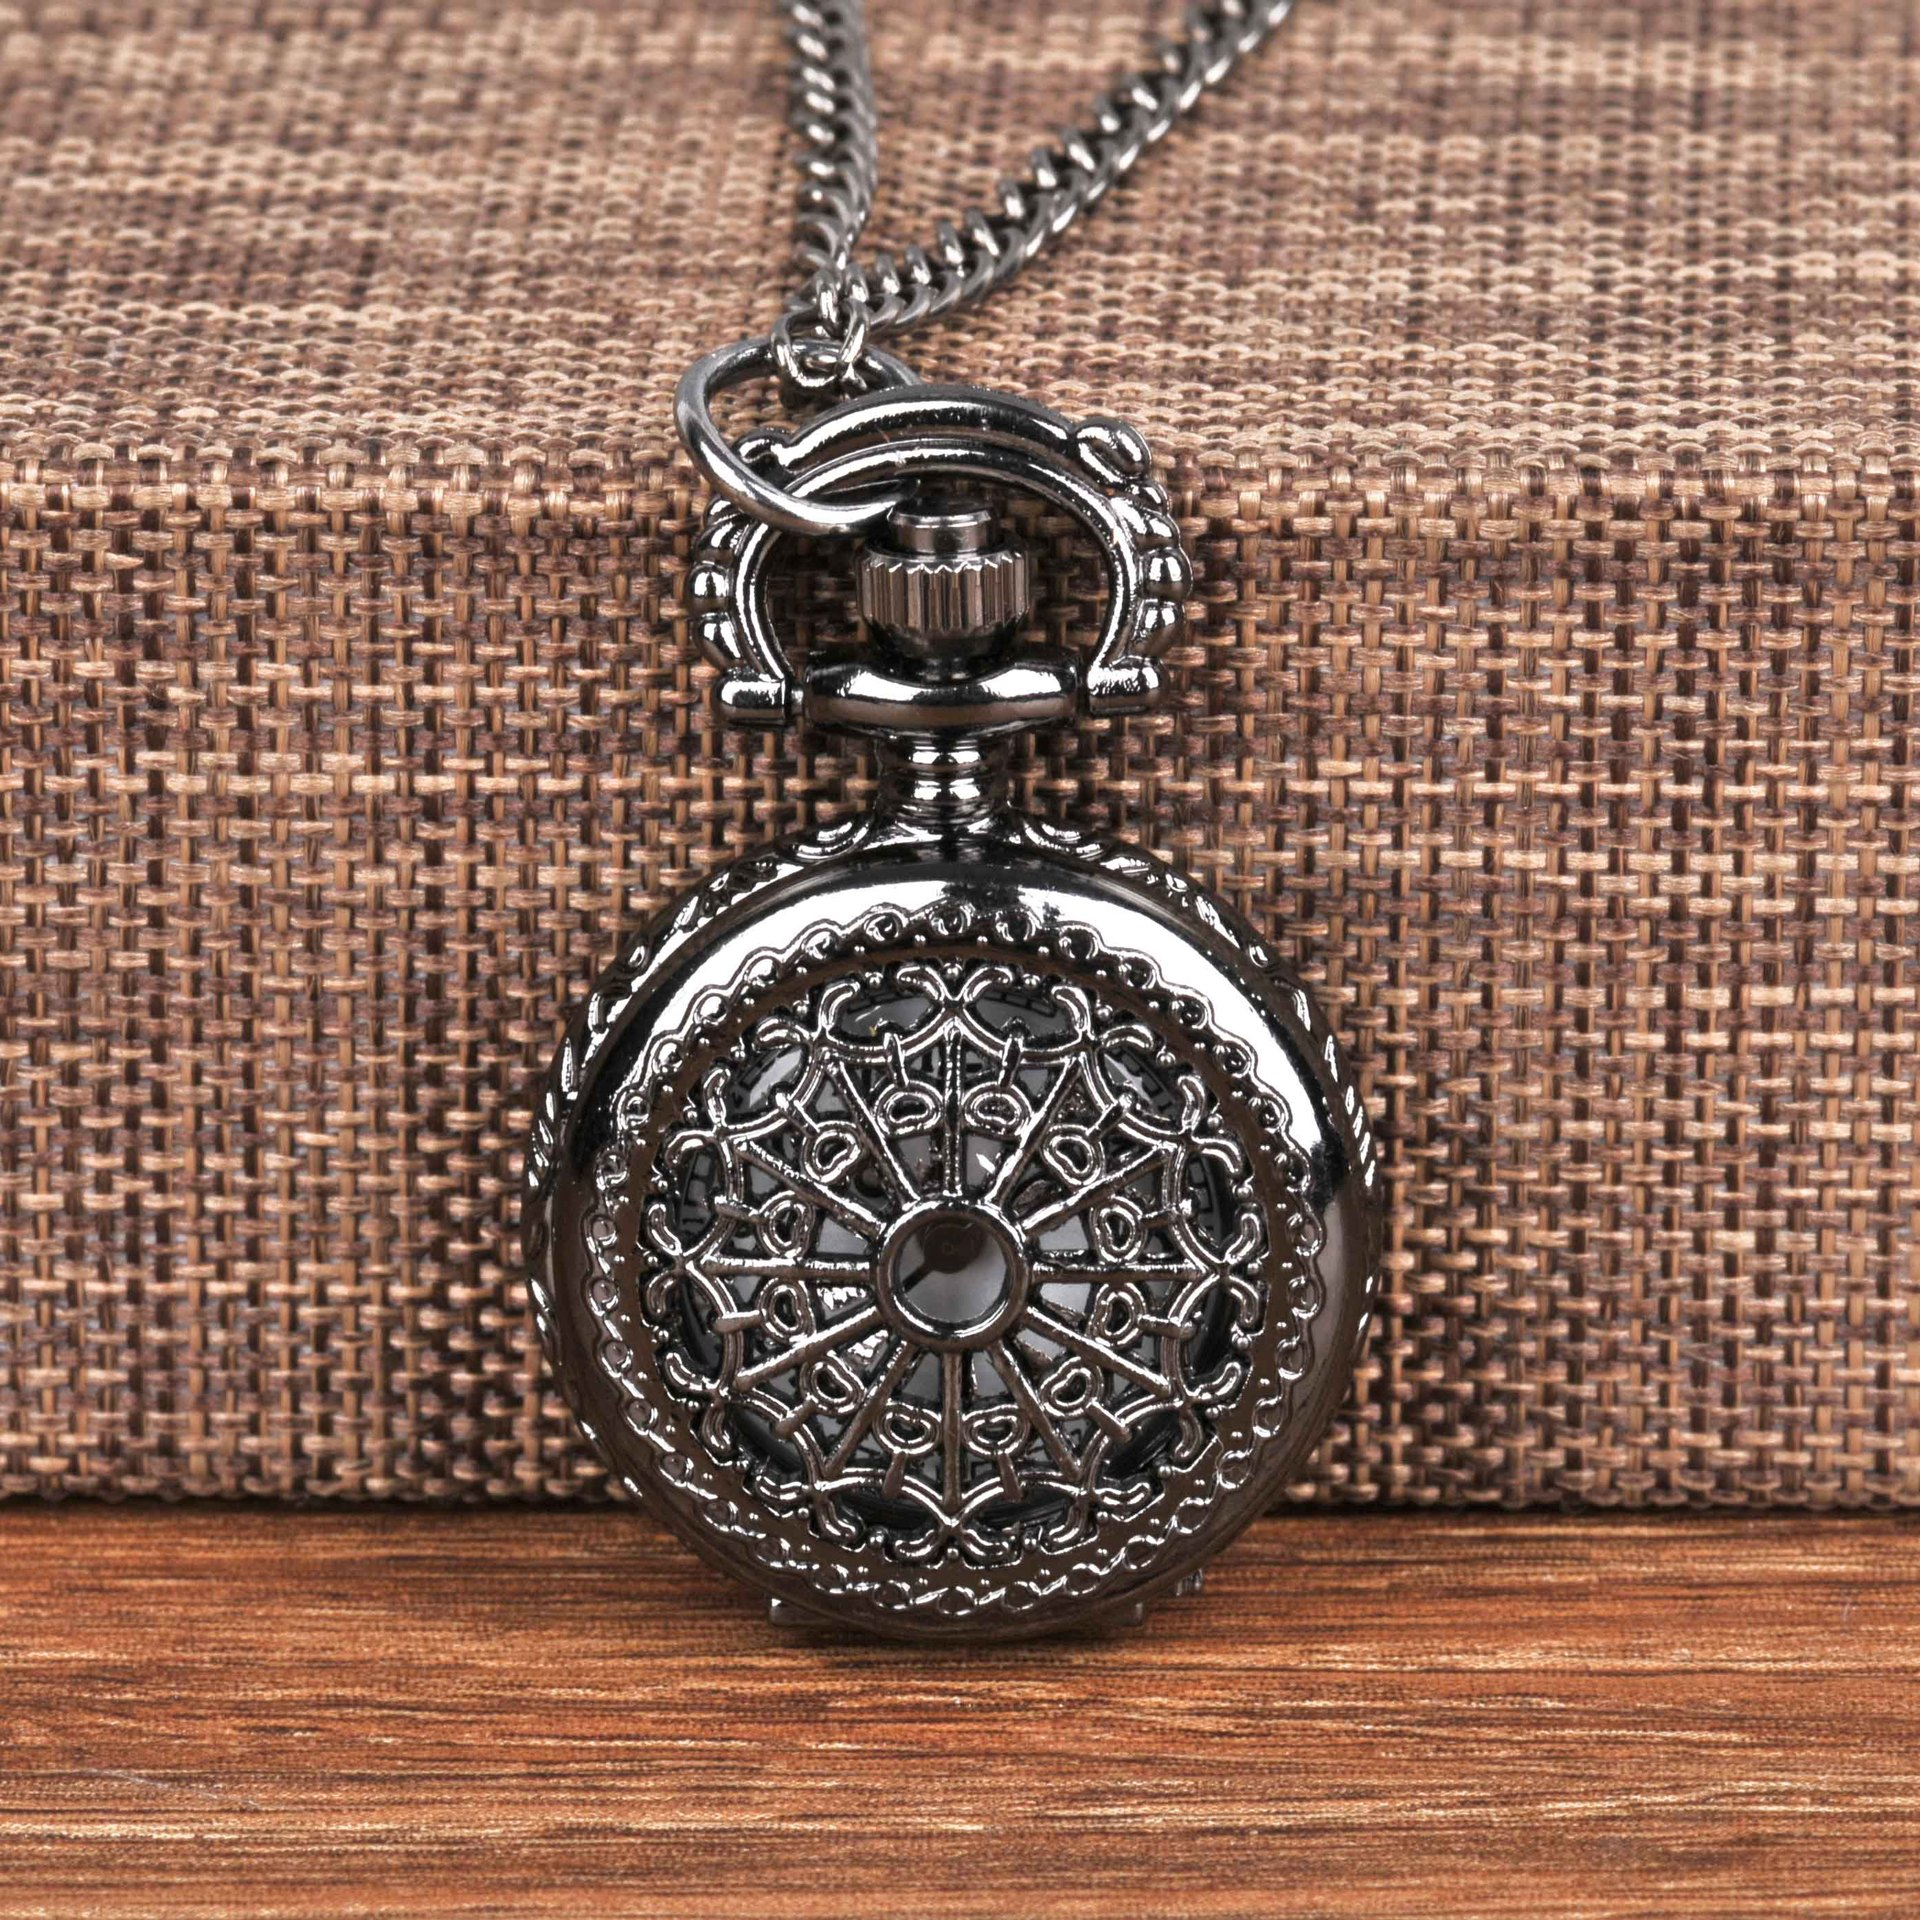 Small Pocket Watch Black Cobweb Retro Vintage Classic With Necklace